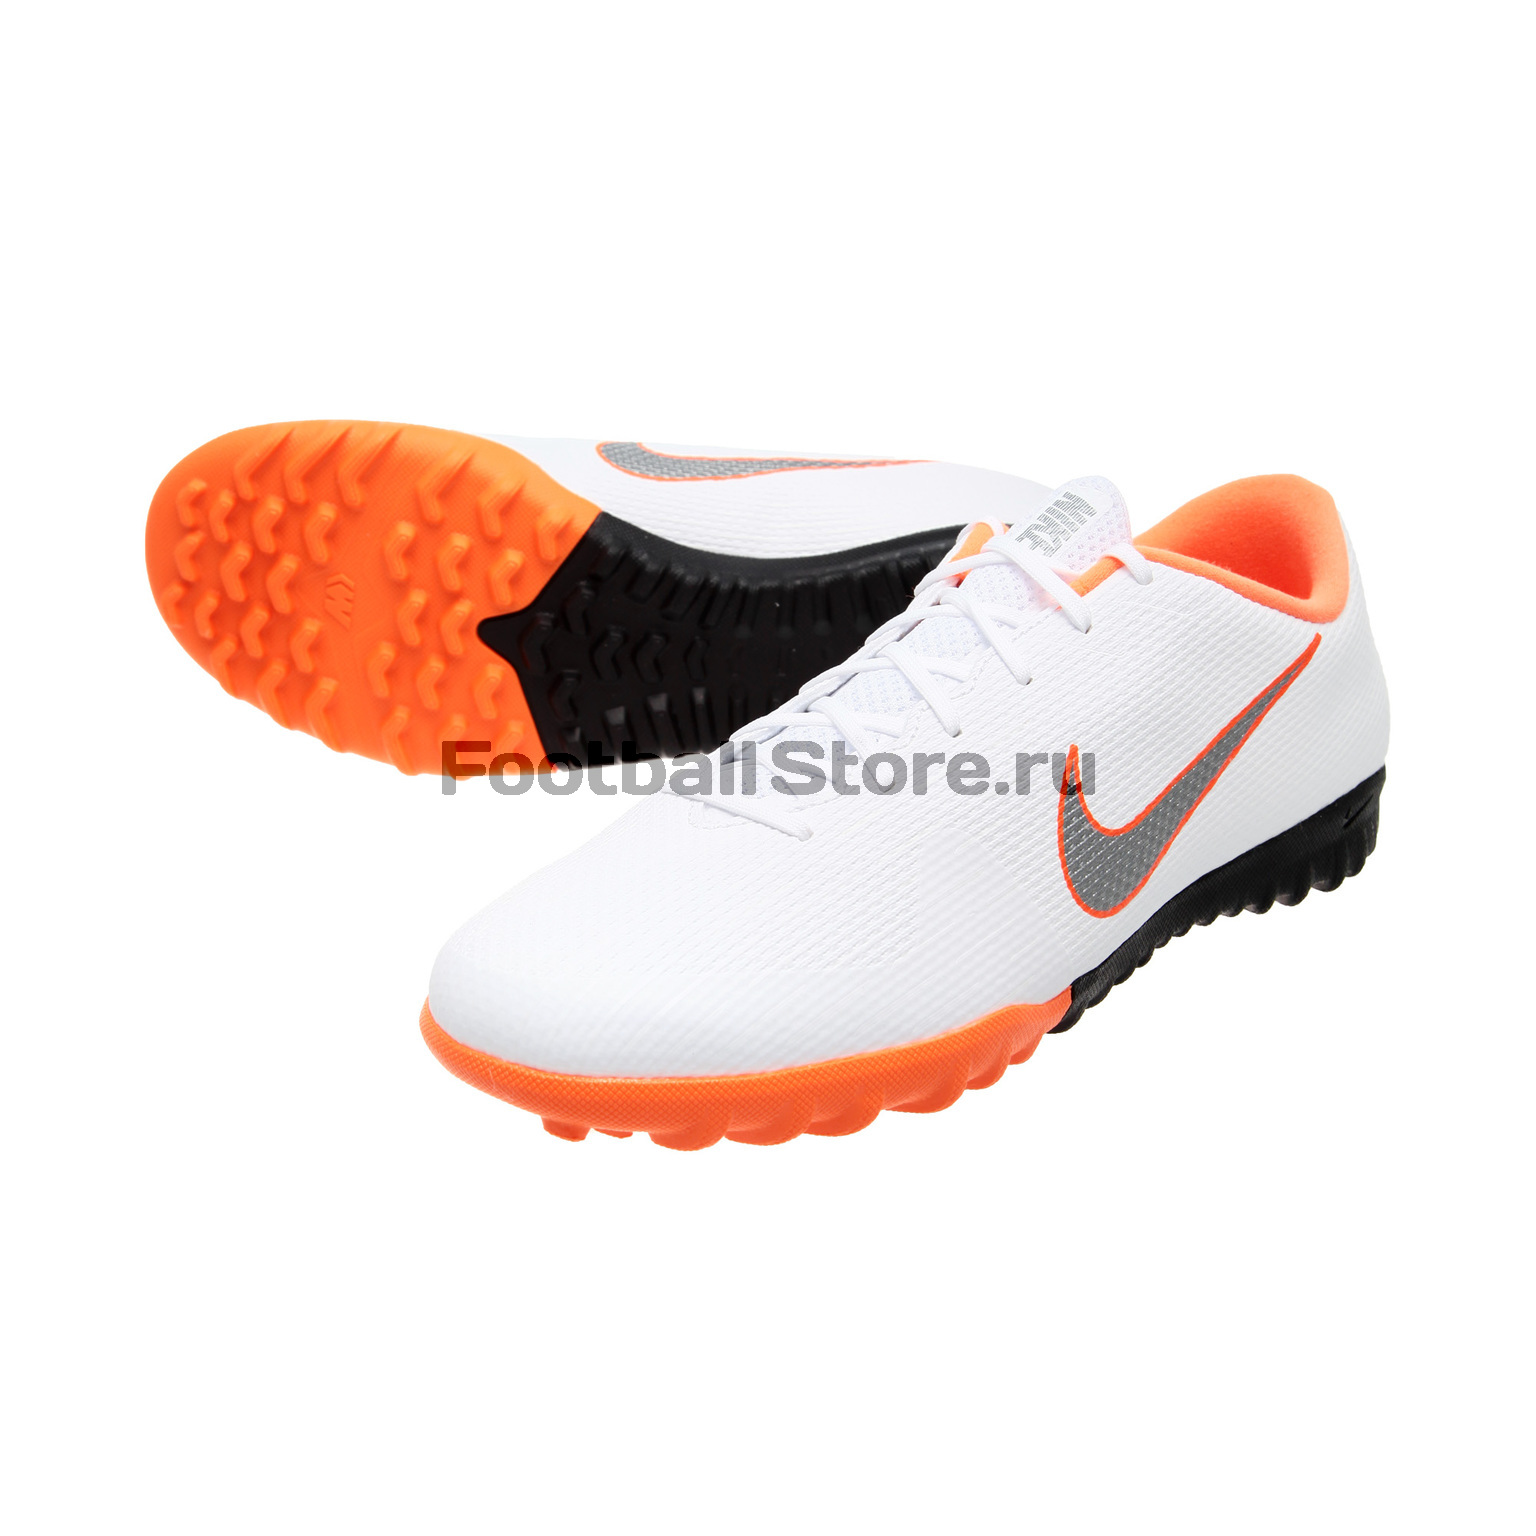 Шиповки Nike VaporX 12 Academy TF AH7384-107 шиповки nike lunar legendx 7 pro tf ah7249 080